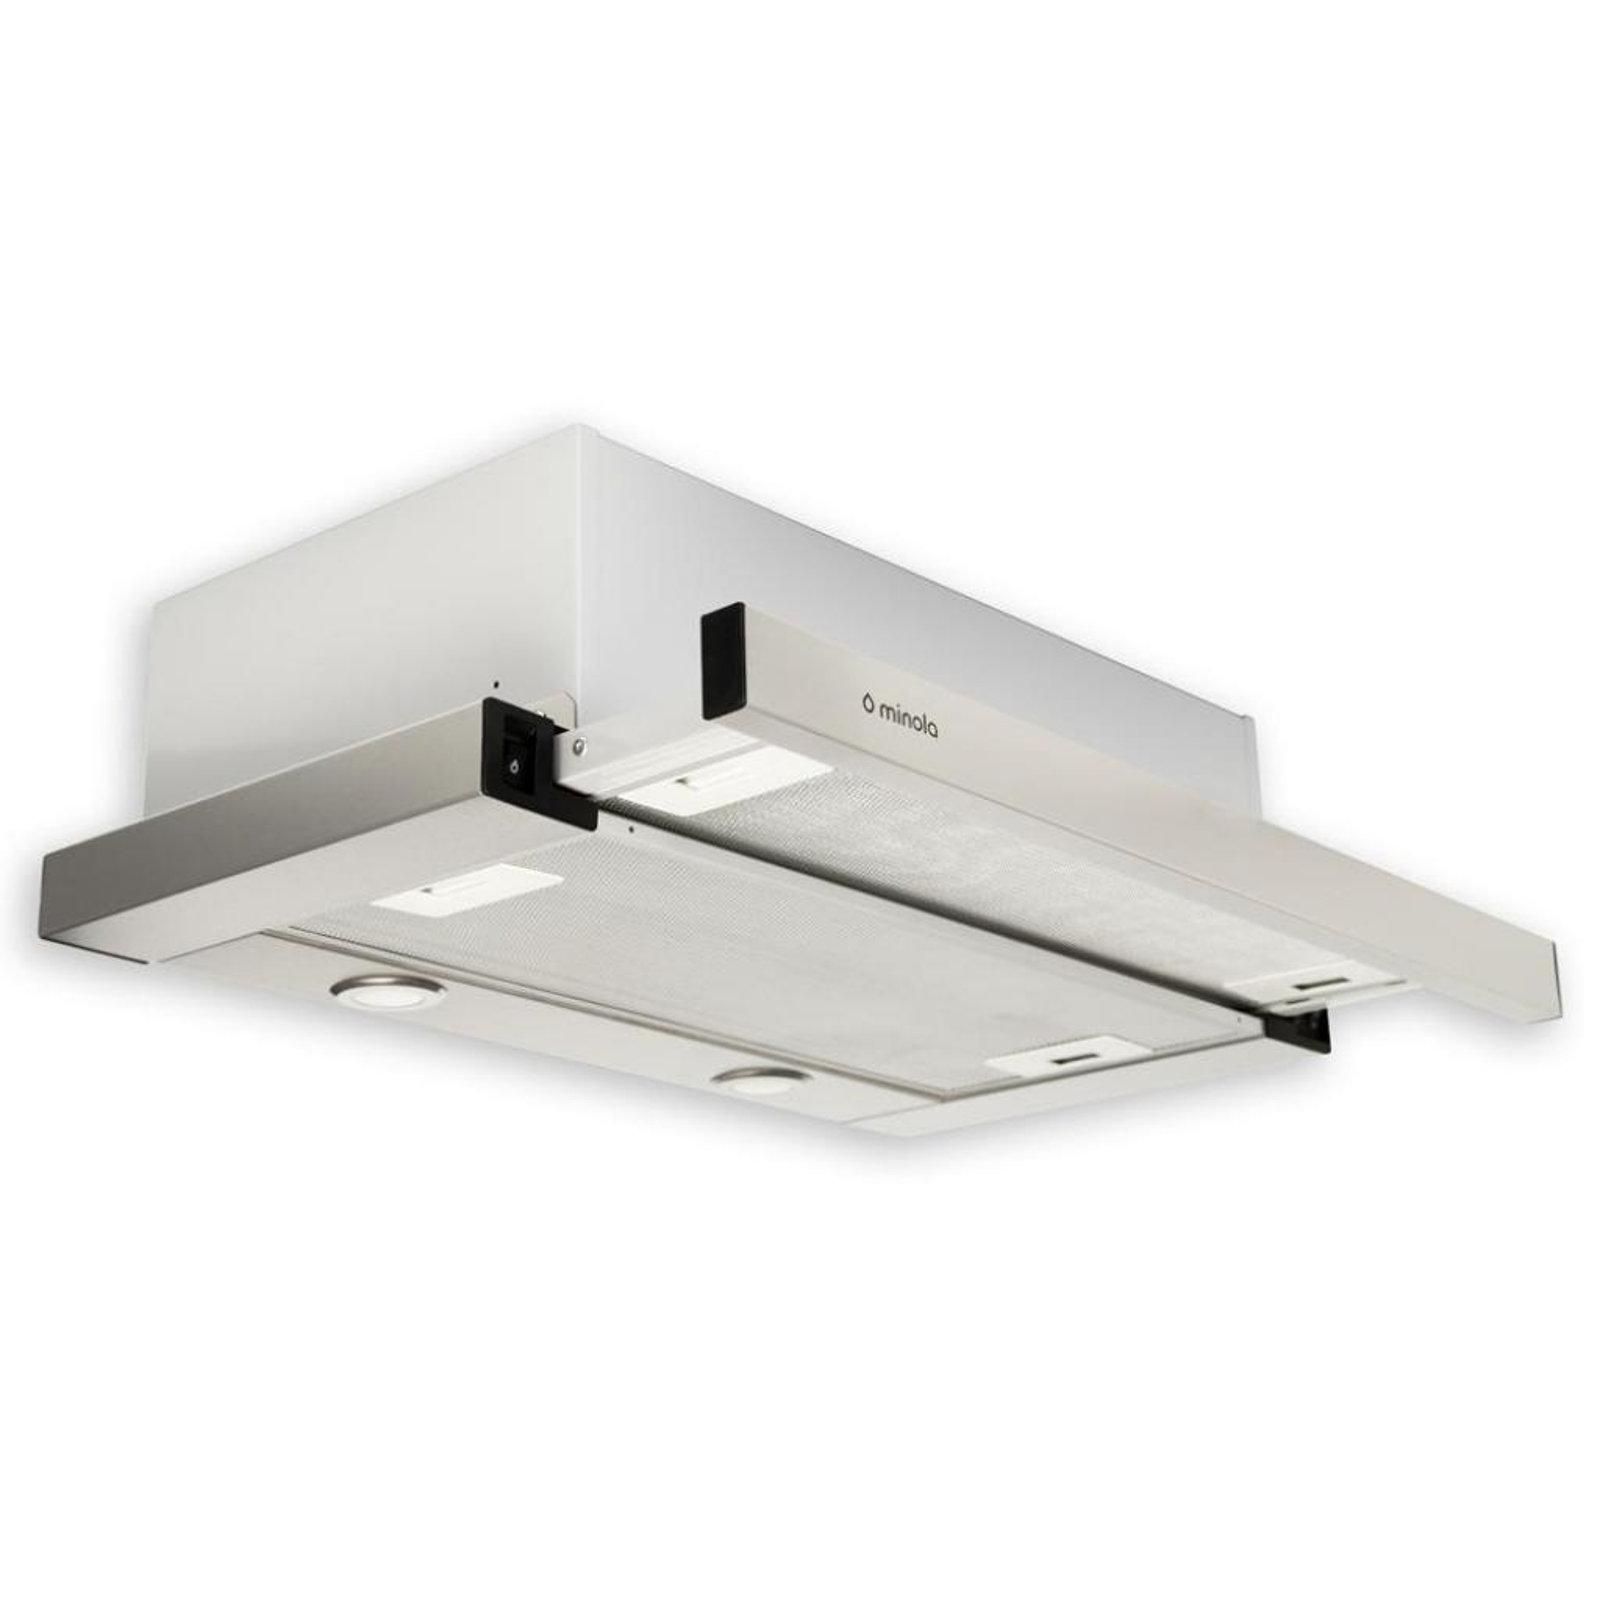 Вытяжка кухонная MINOLA HTL 6012 FULL INOX 450 LED